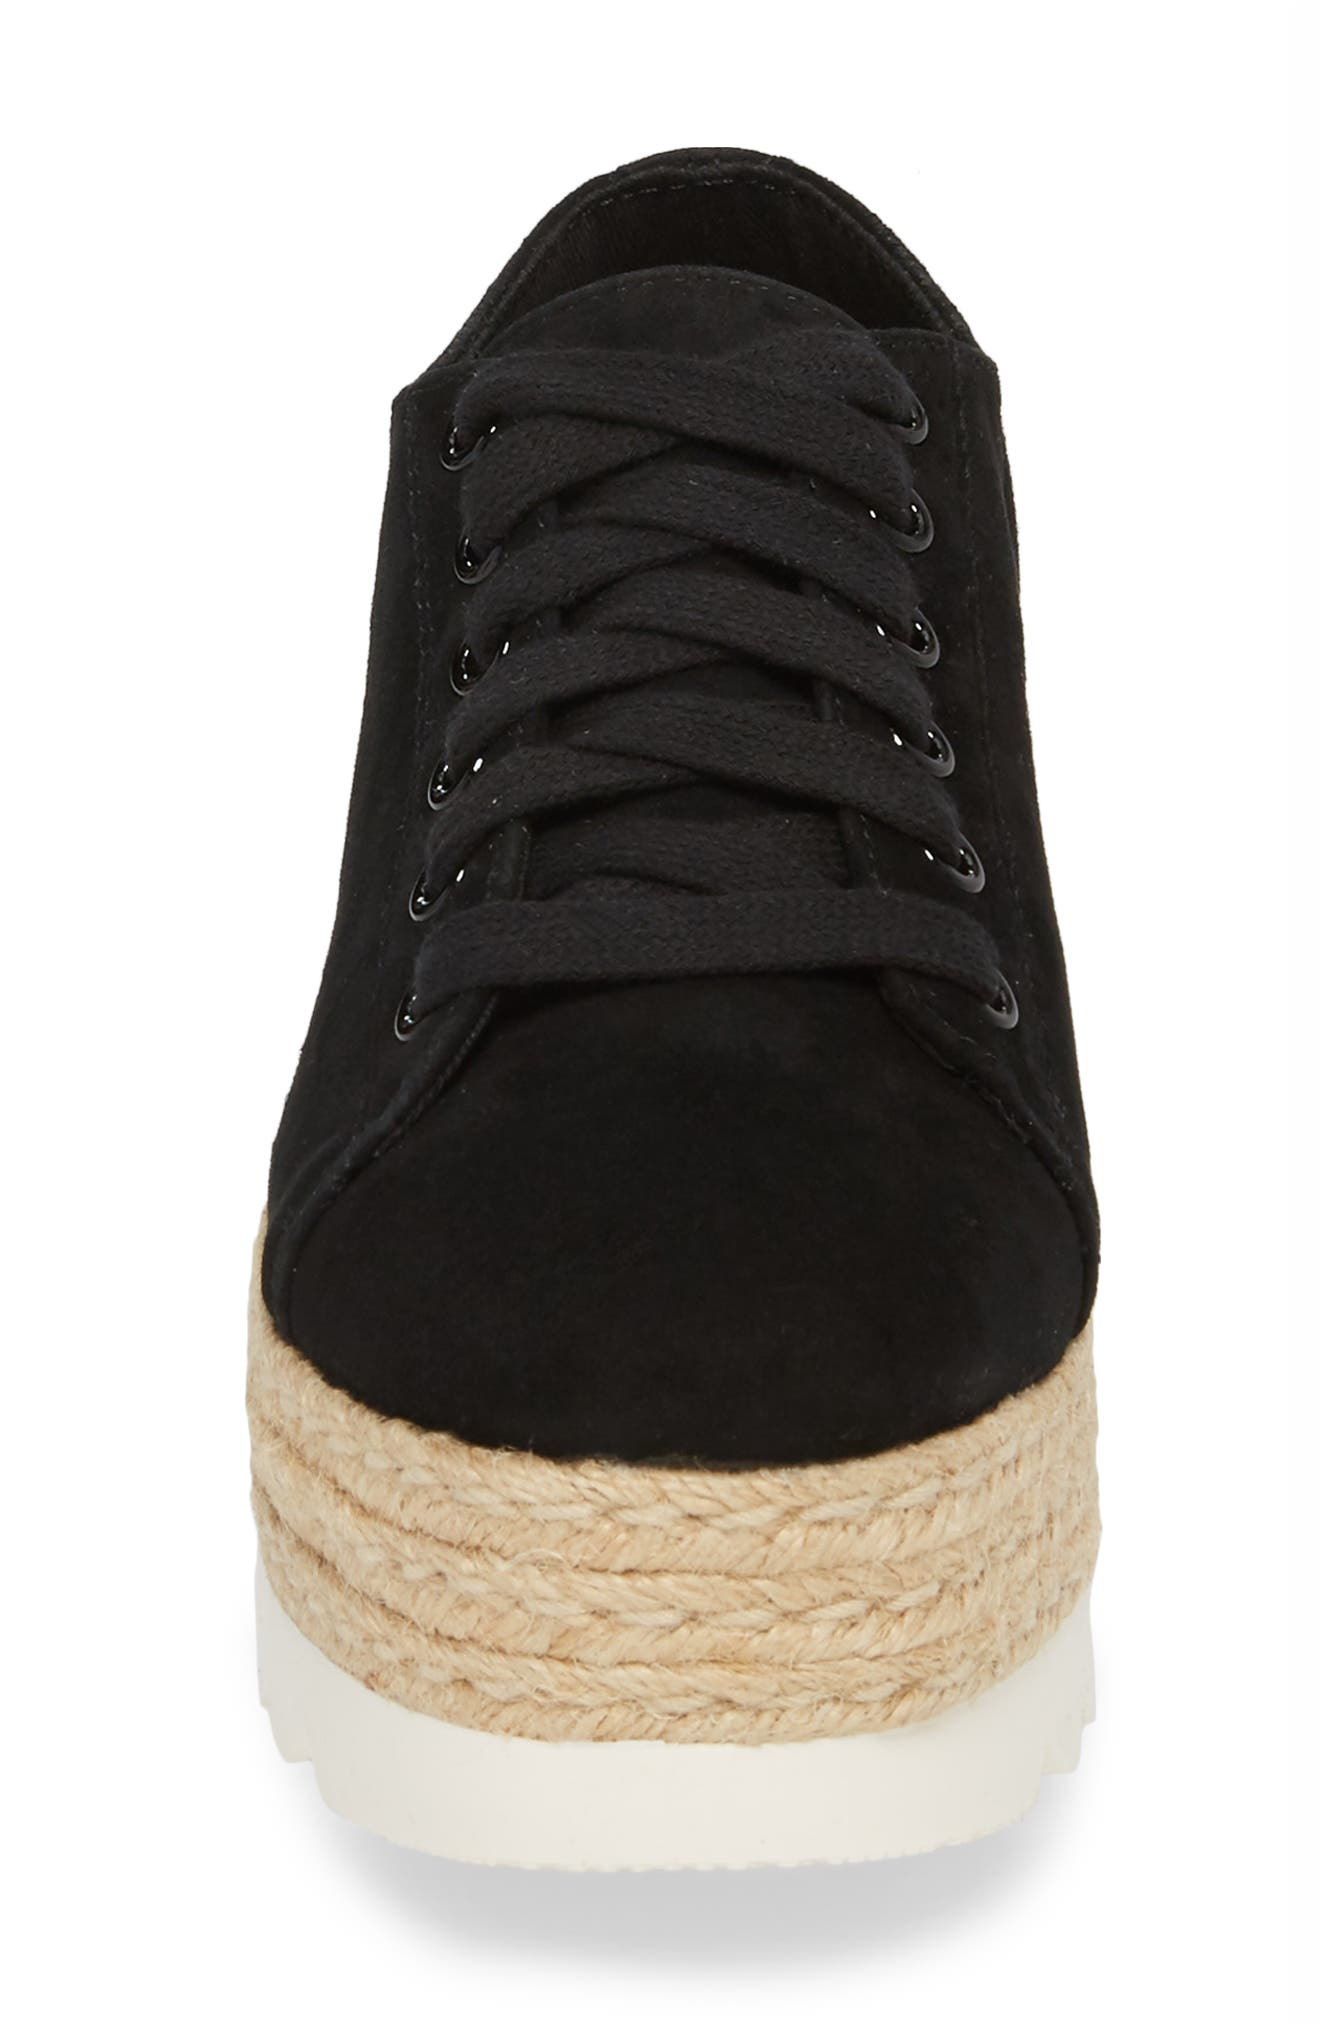 Karma Espadrille Platform Sneaker,                             Alternate thumbnail 4, color,                             BLACK SUED